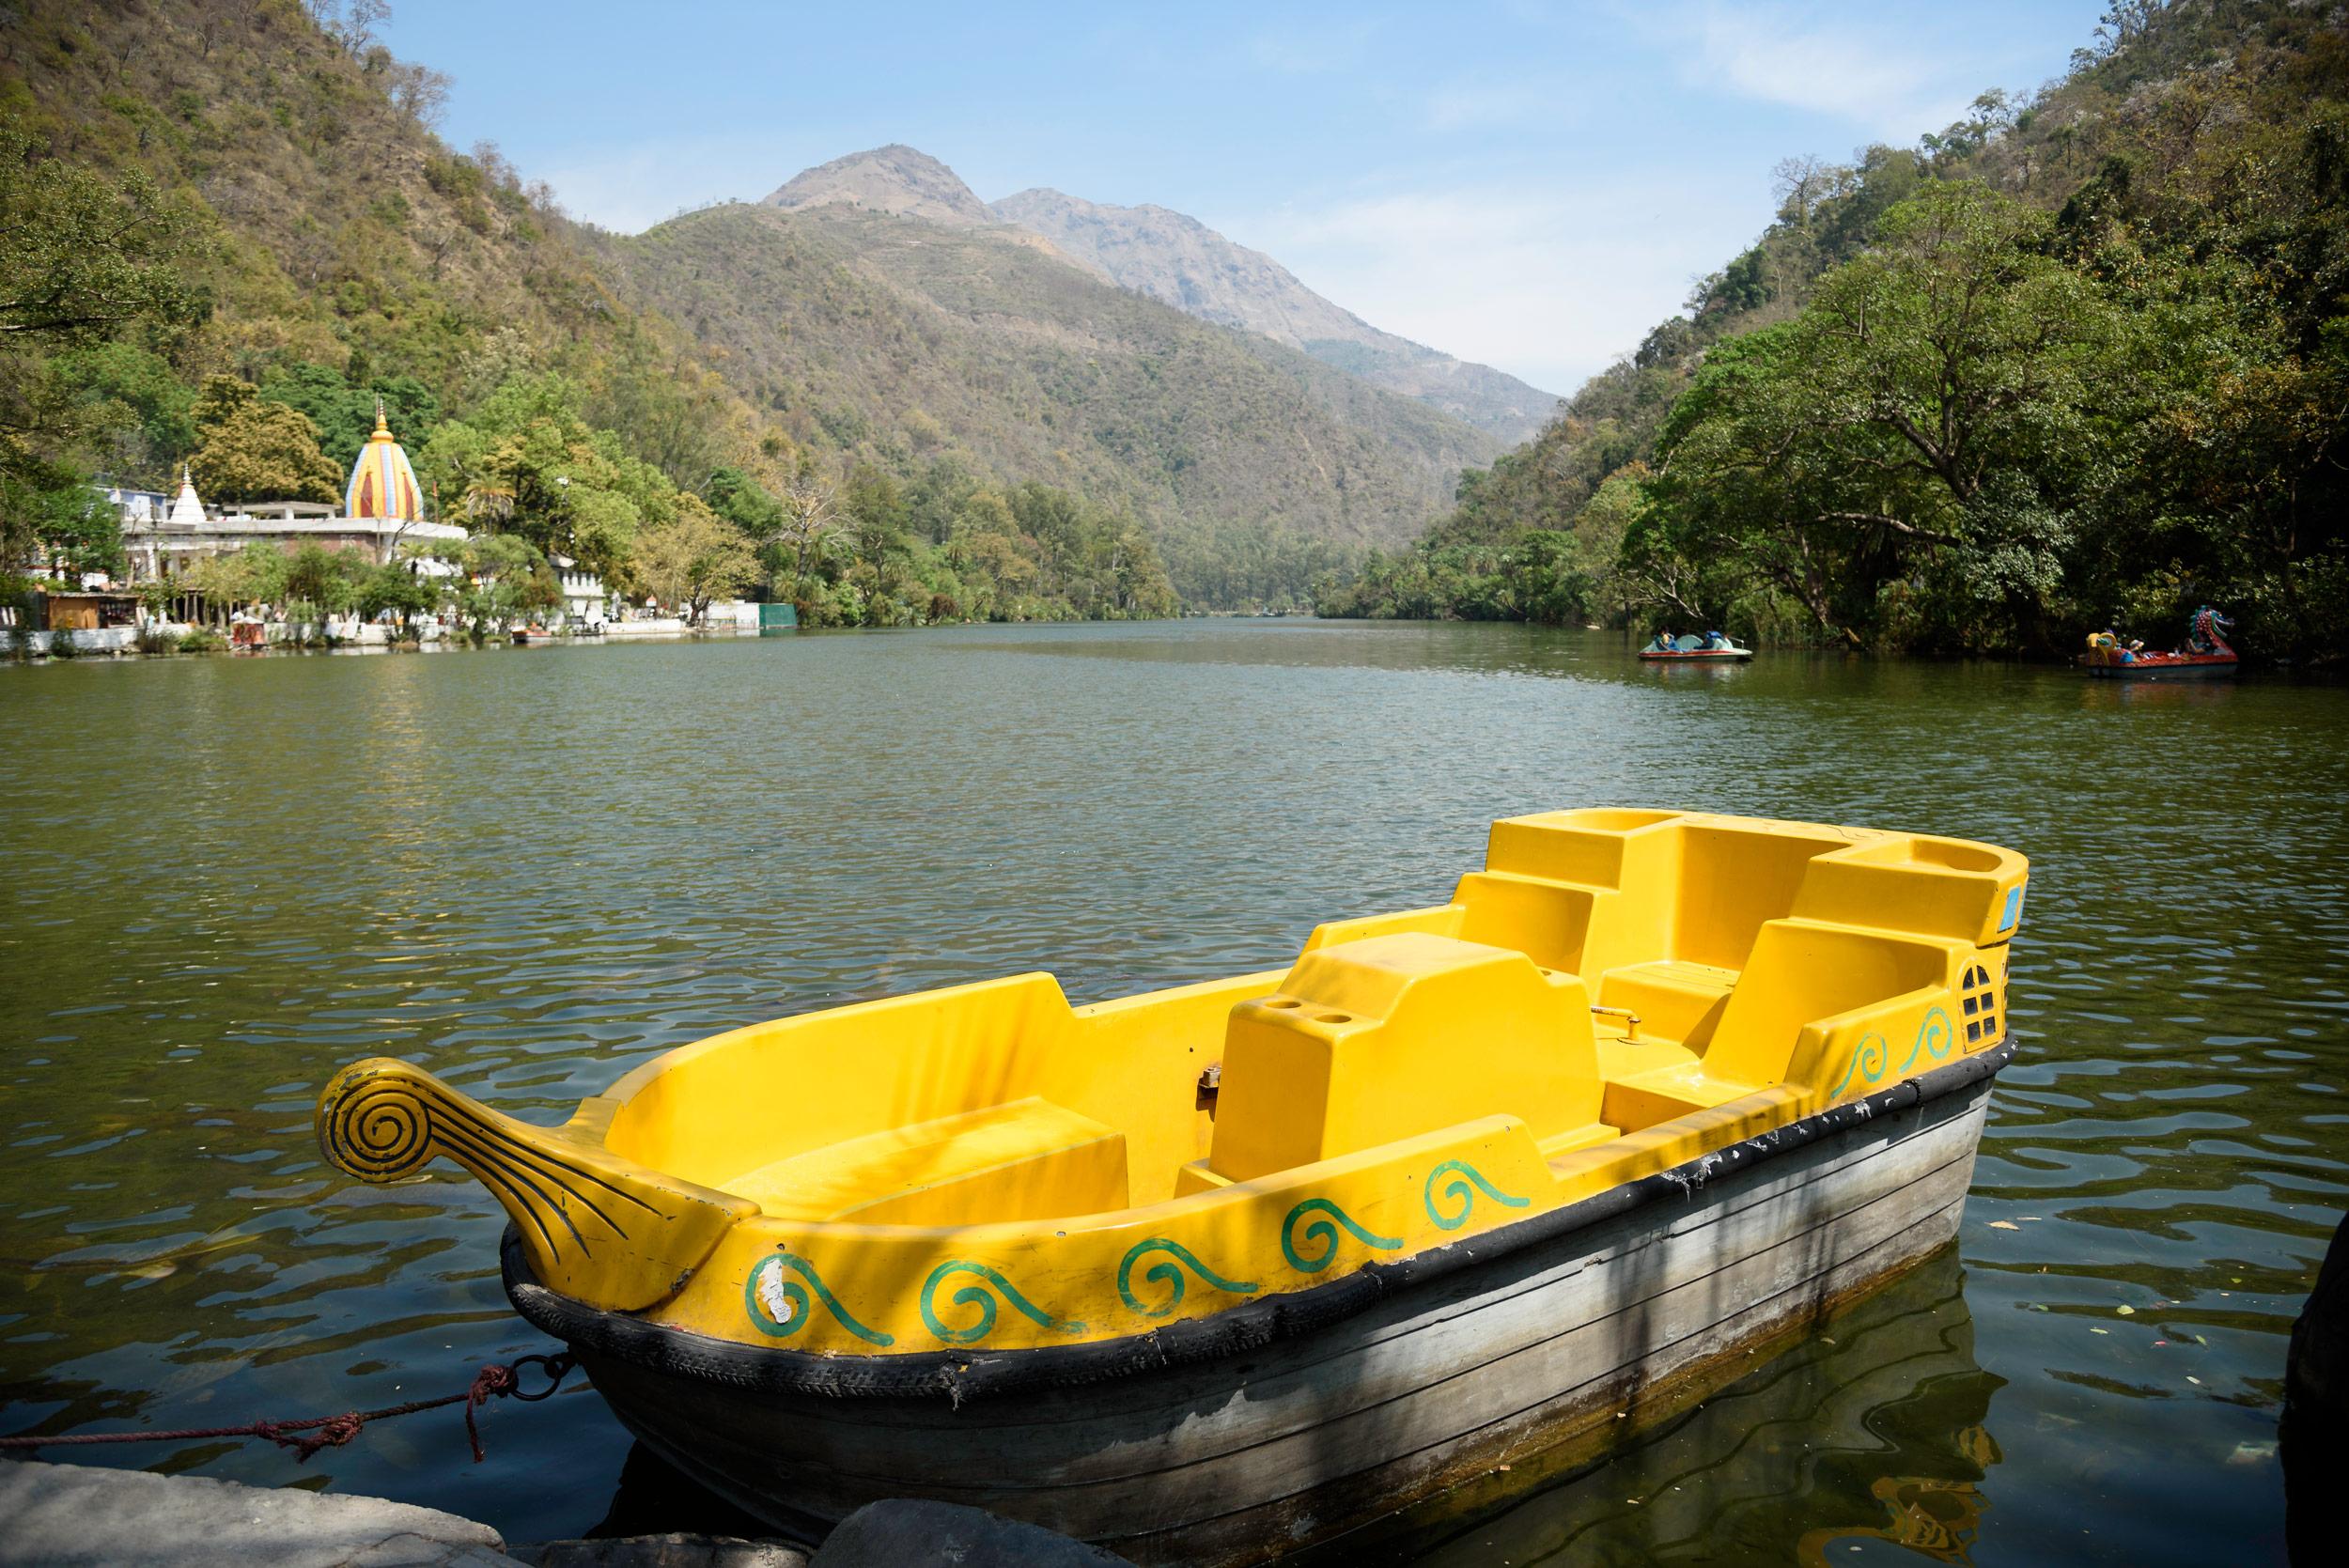 Destination reached : Renuka Lake.